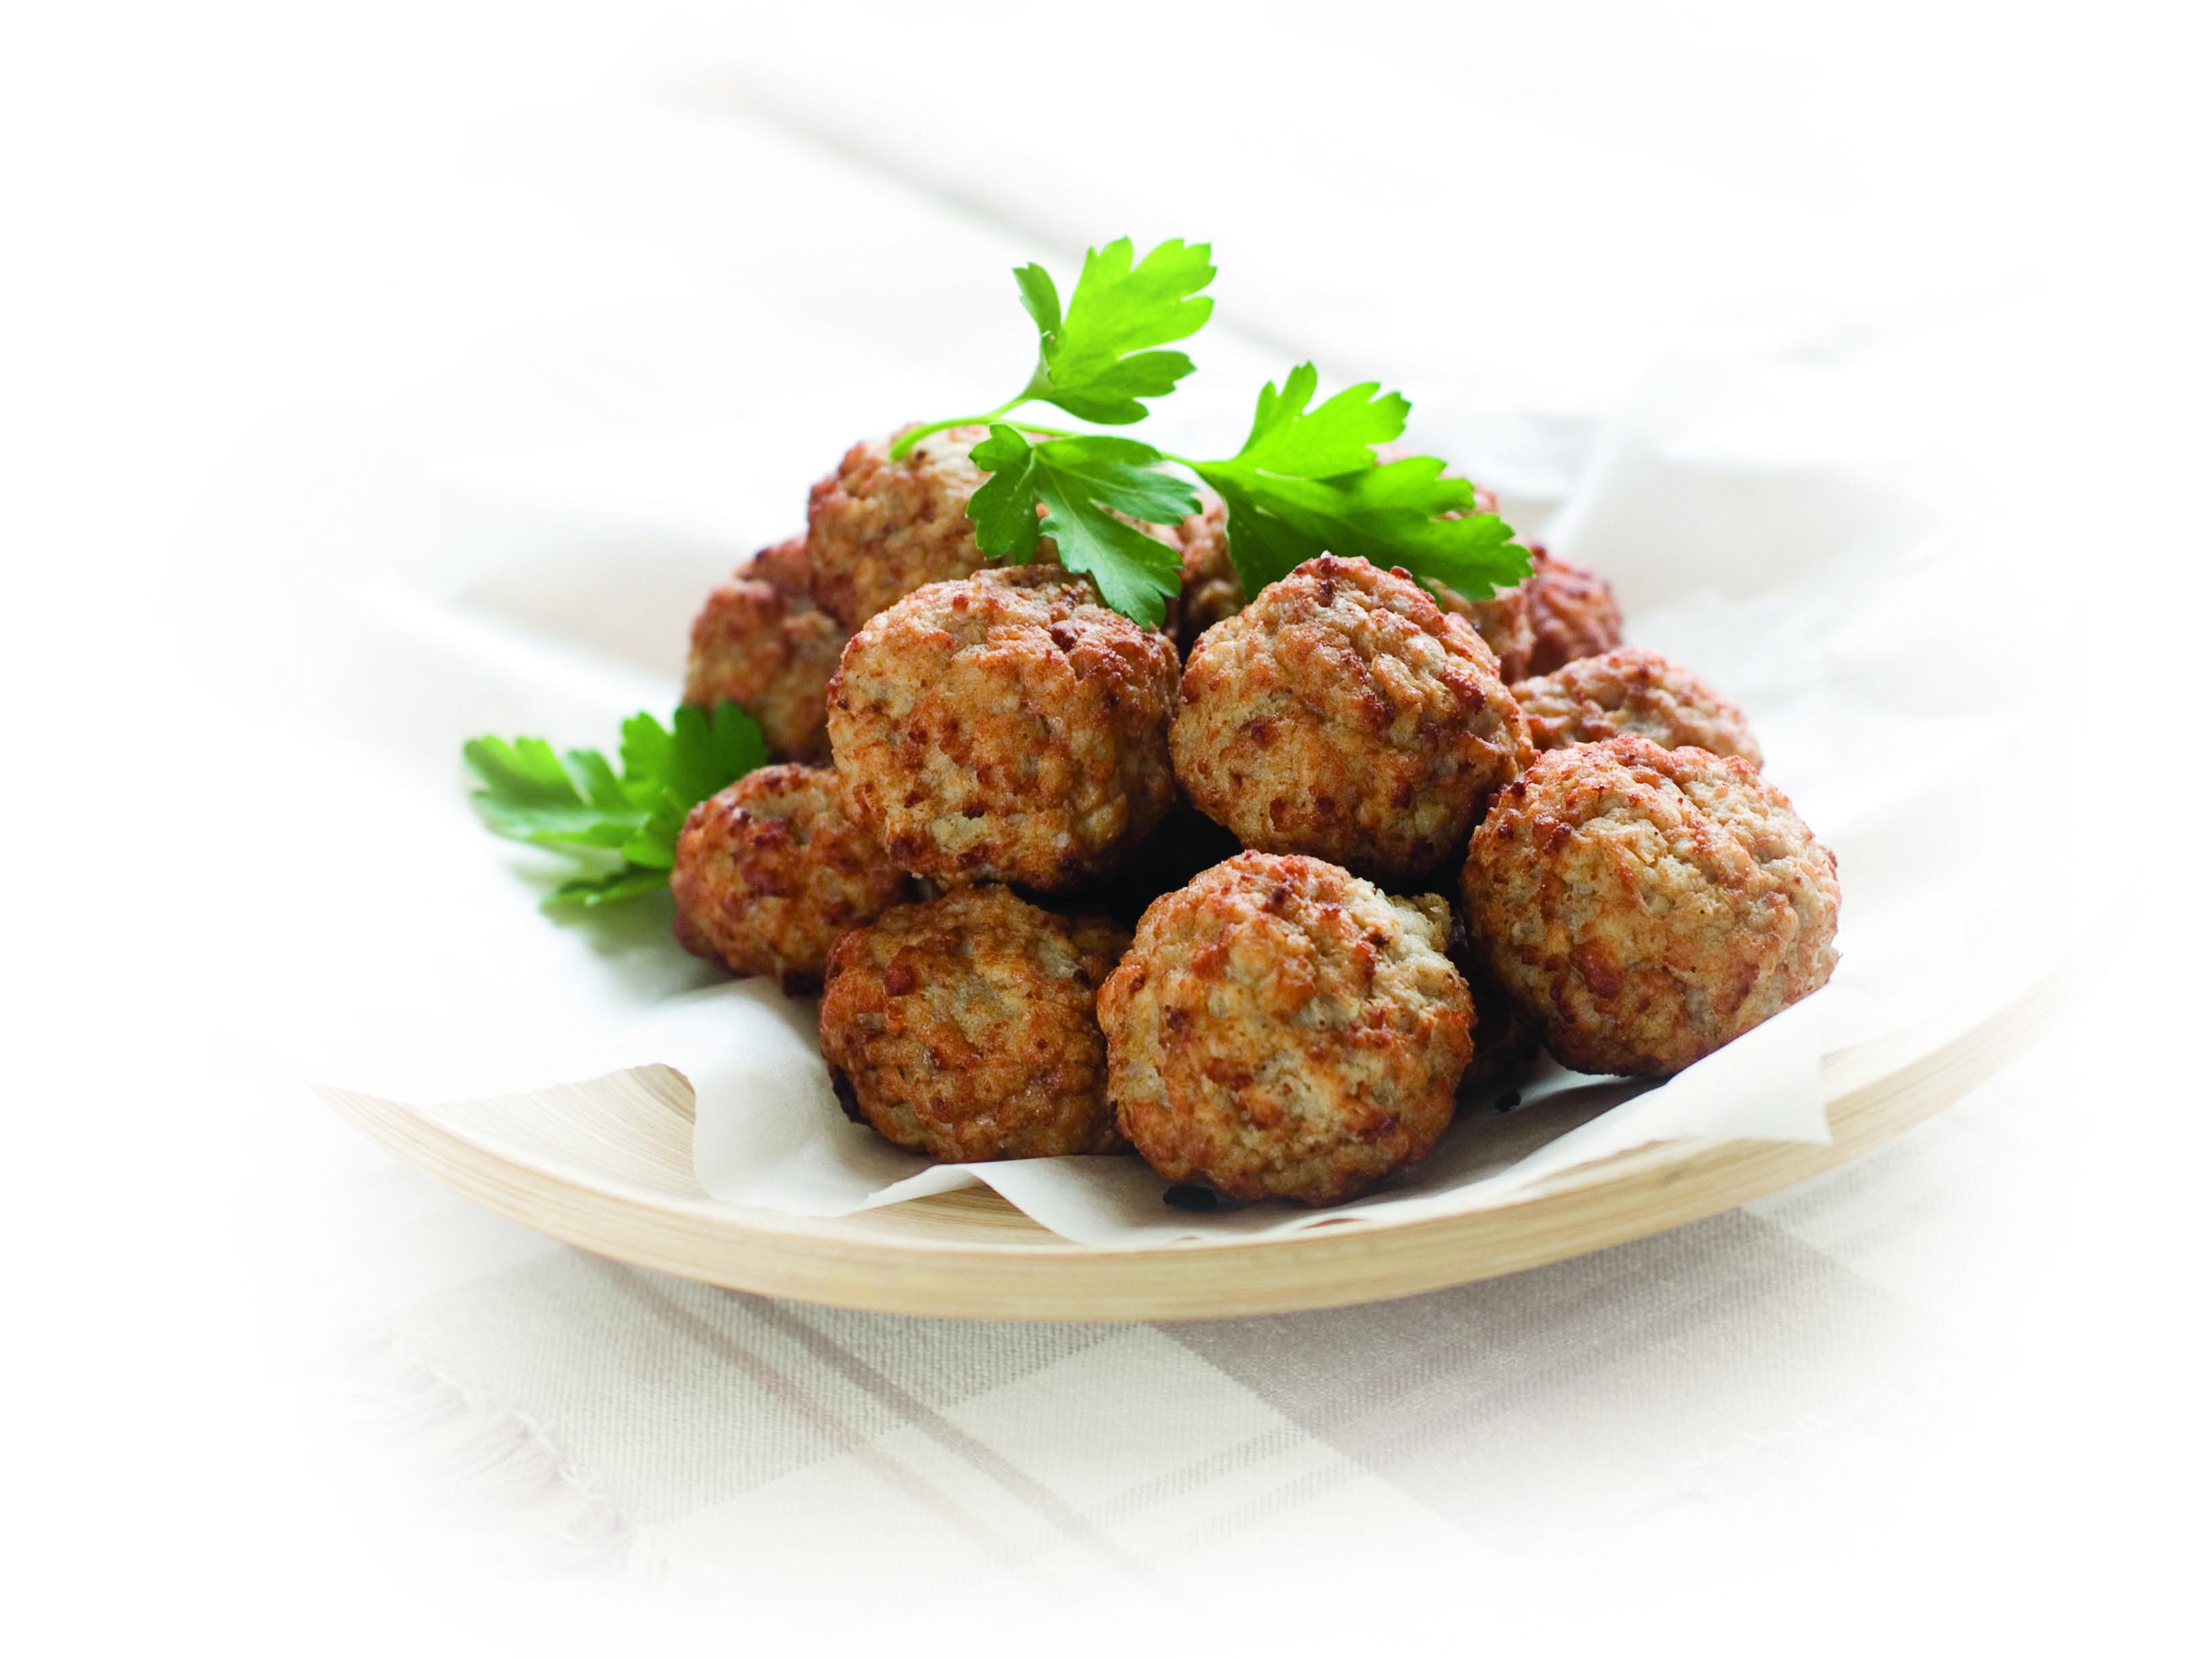 pureland america organic frozen meatballs appetizer recipe